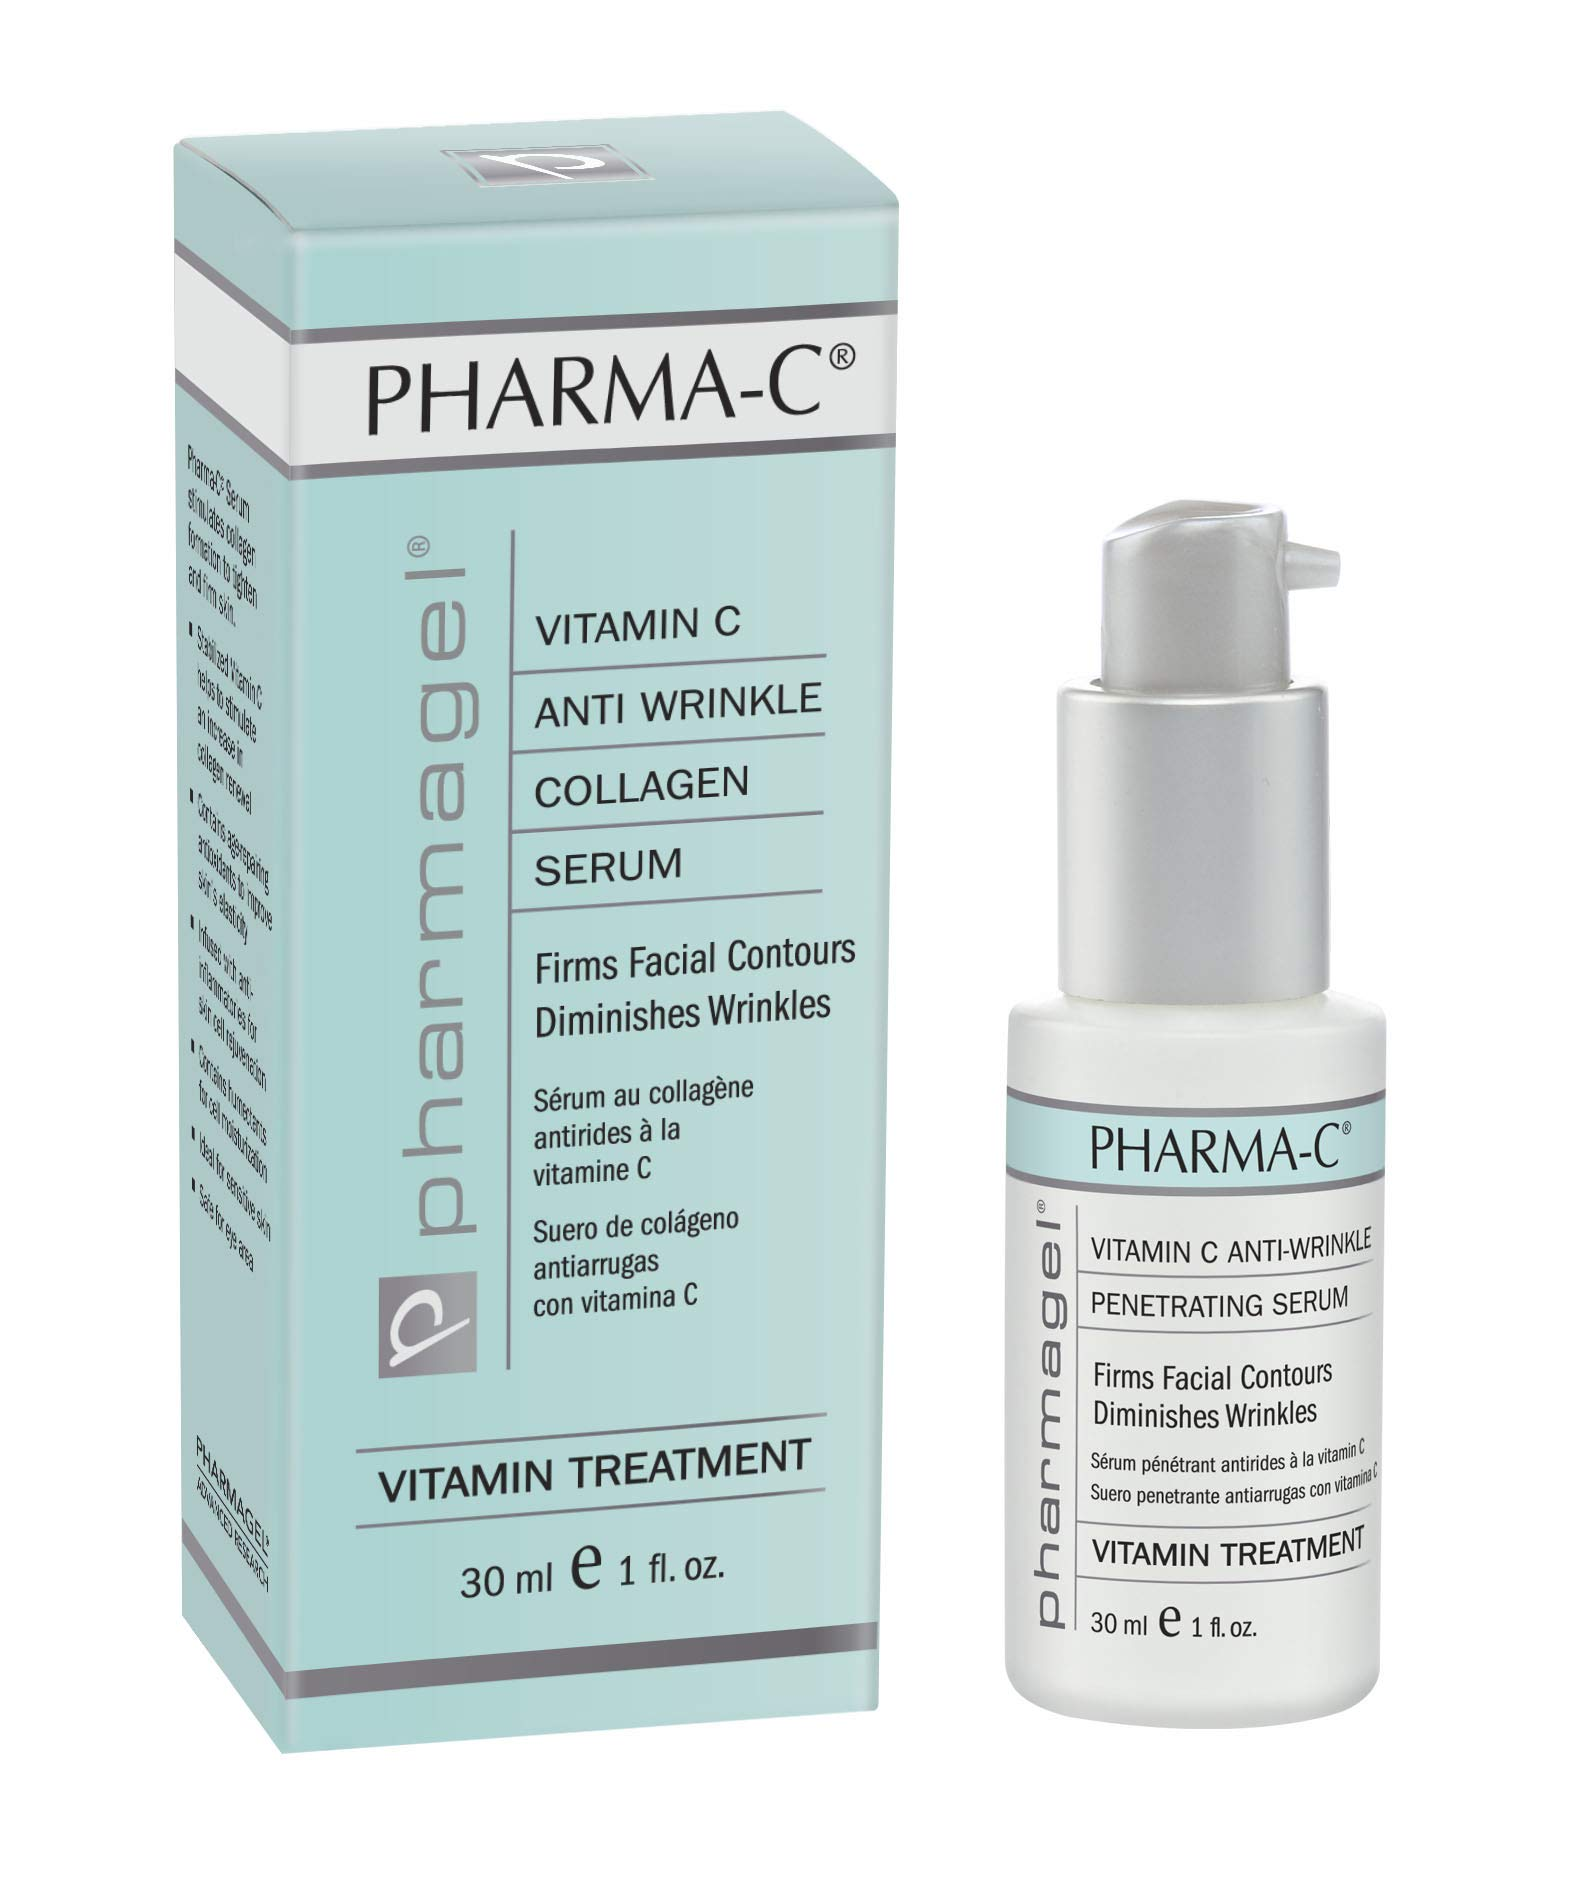 CDM product Pharmagel Pharma-C Vitamin Serum, 1 Fluid Ounce big image